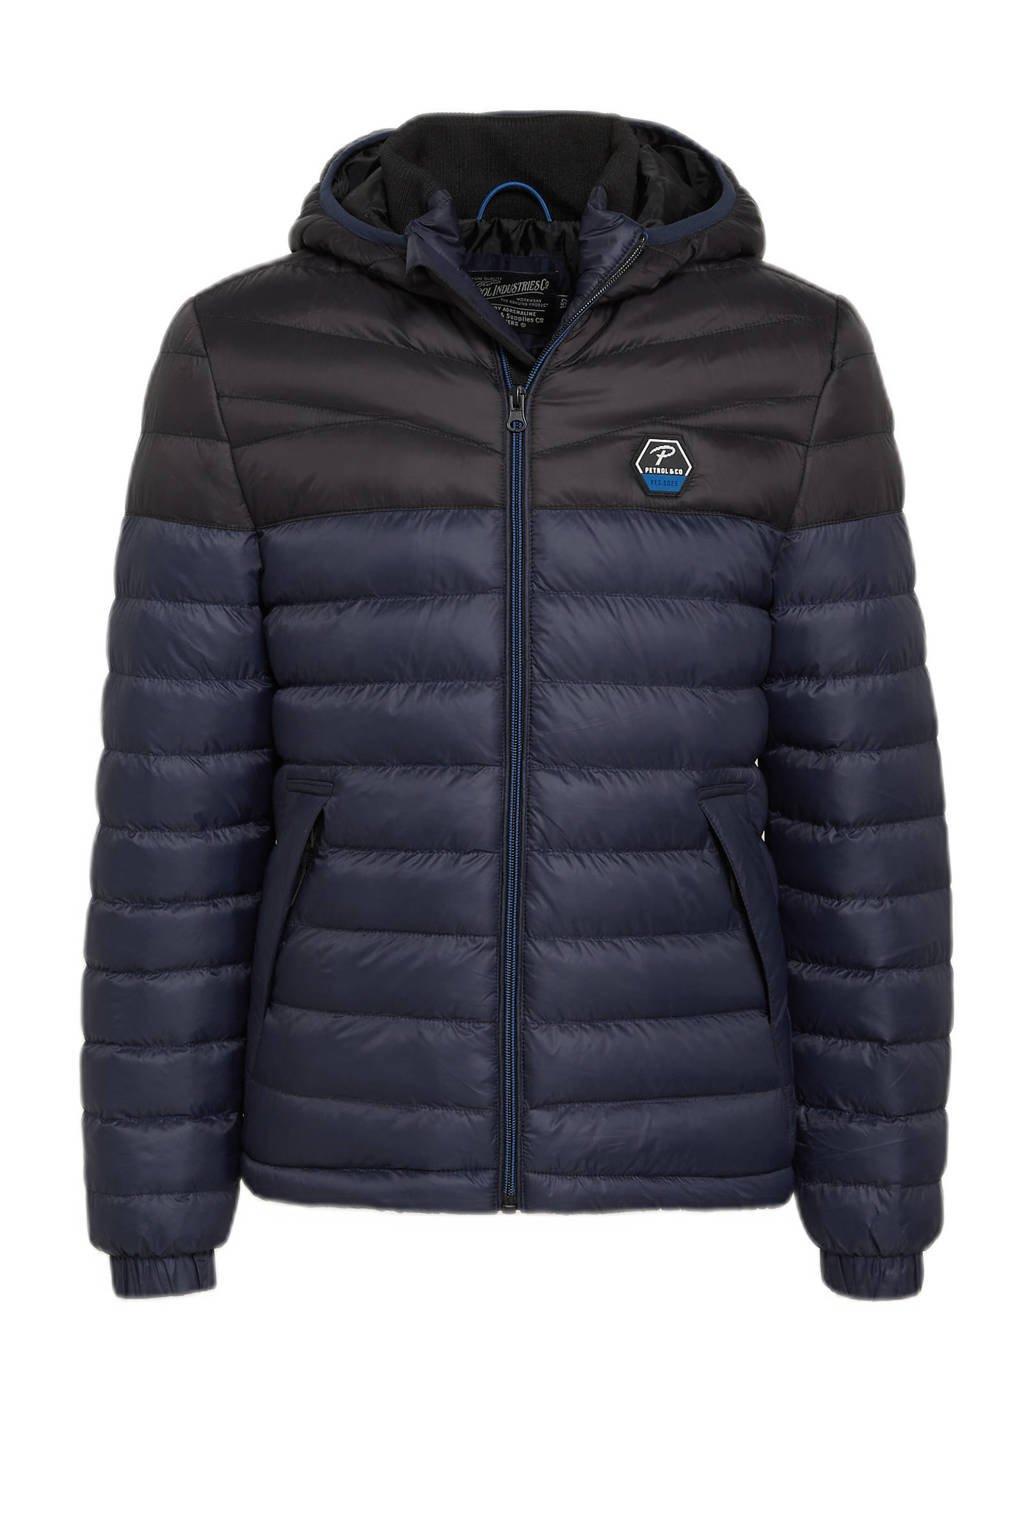 Petrol Industries gewatteerde winterjas donkerblauw/zwart, Donkerblauw/zwart